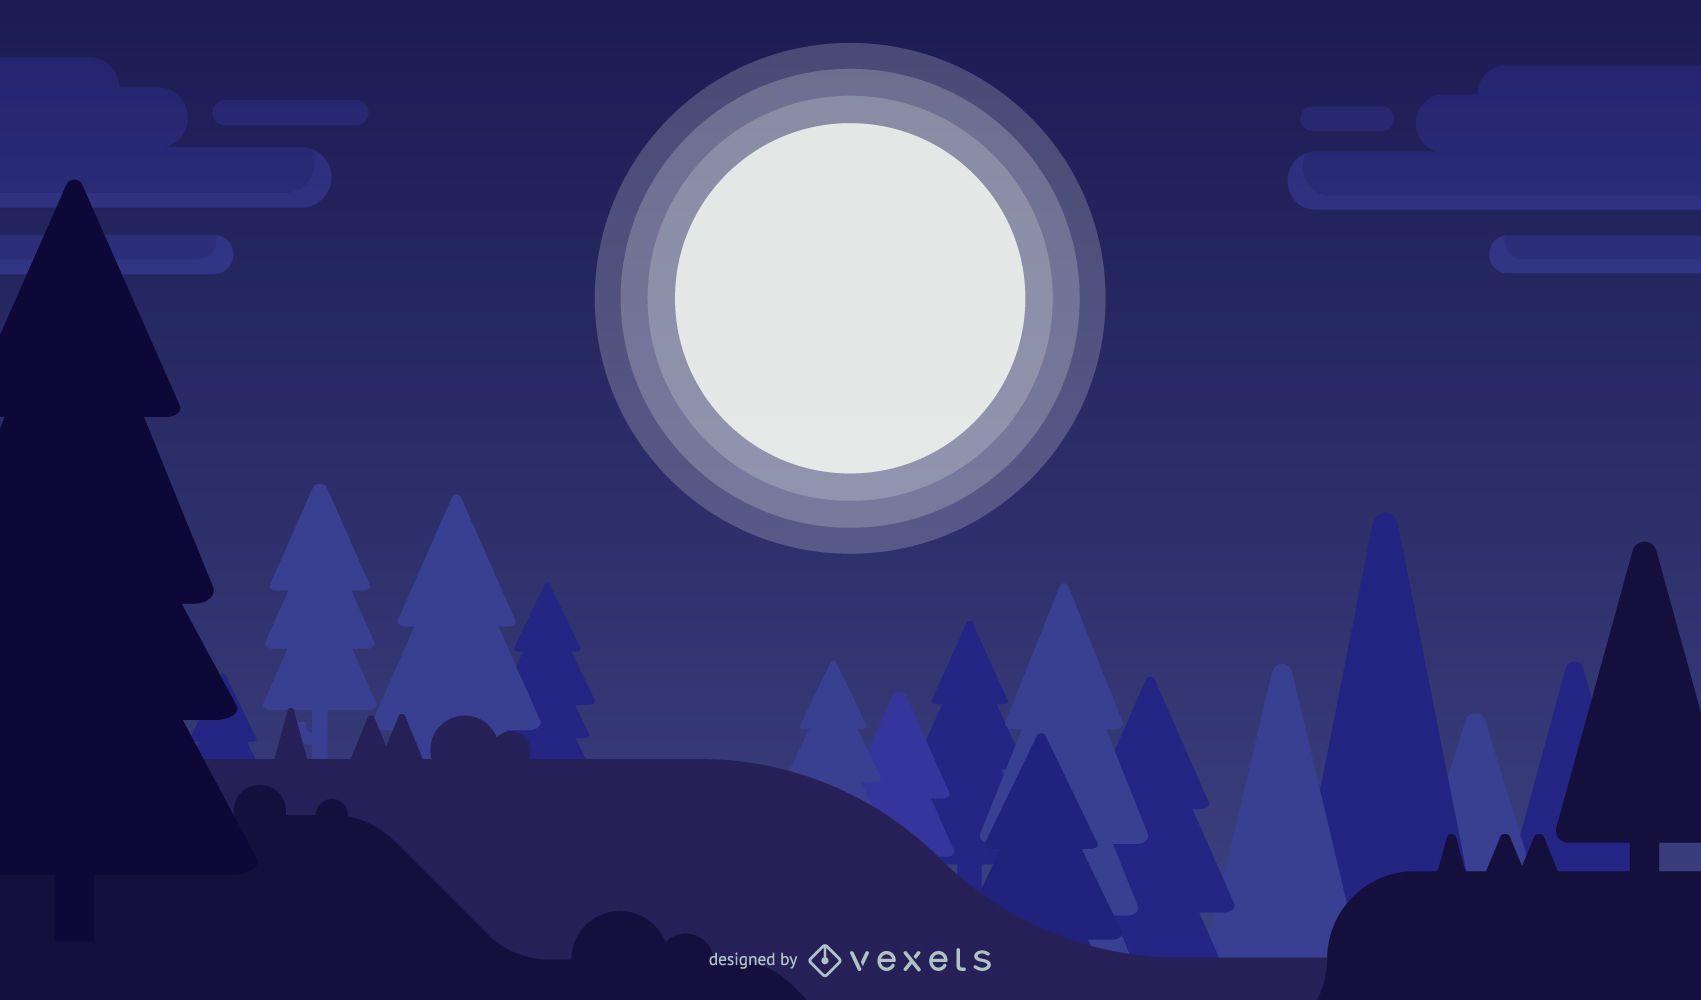 Diseño de fondo de luna llena